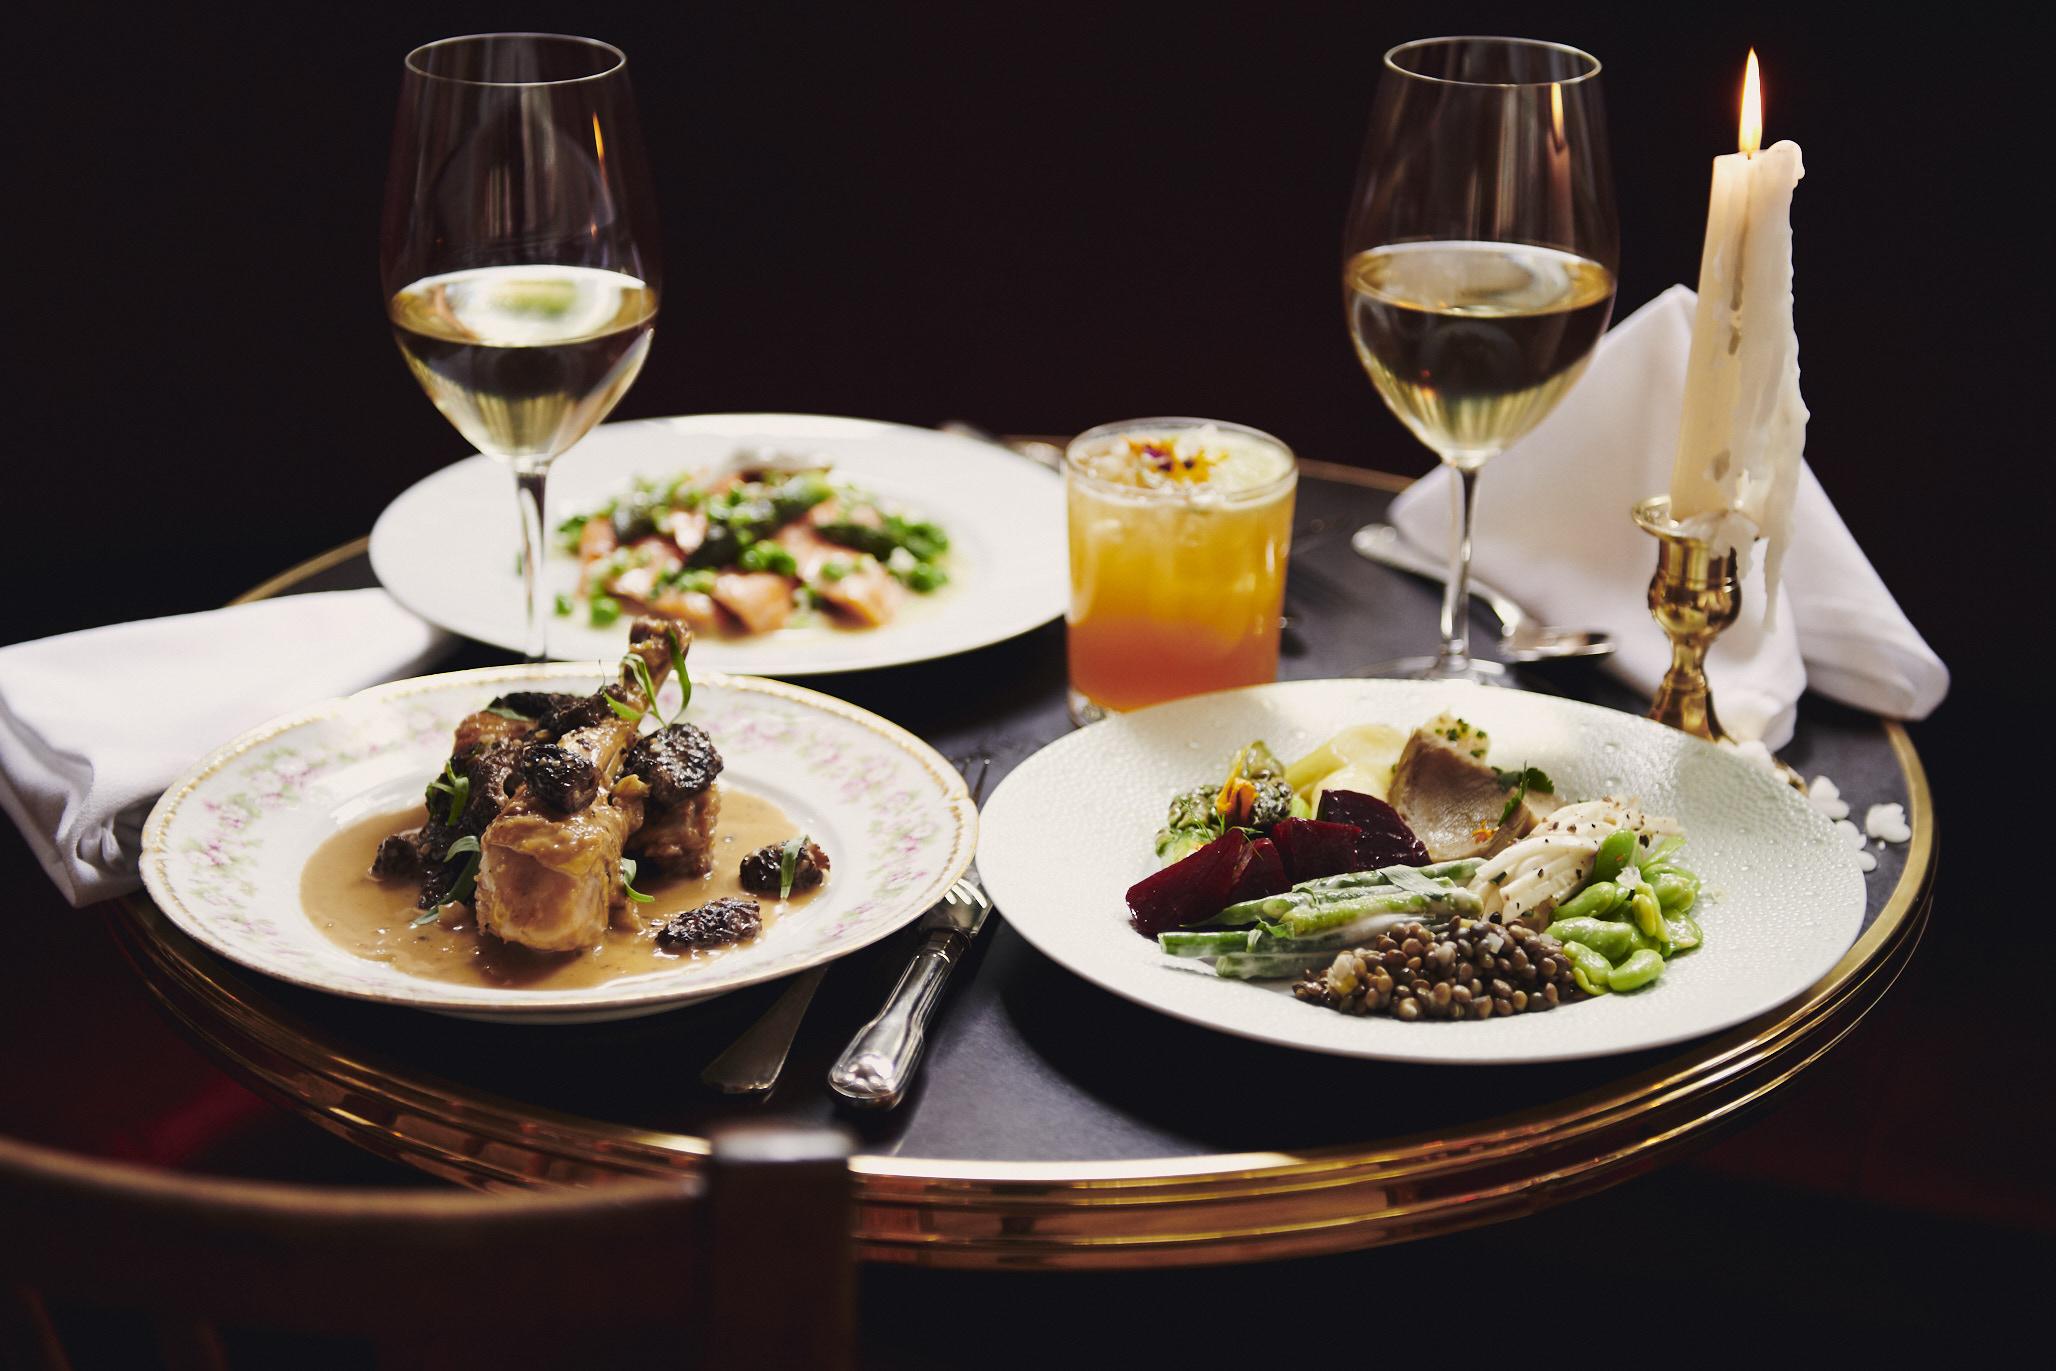 Food at Bistro Pierre Lapin